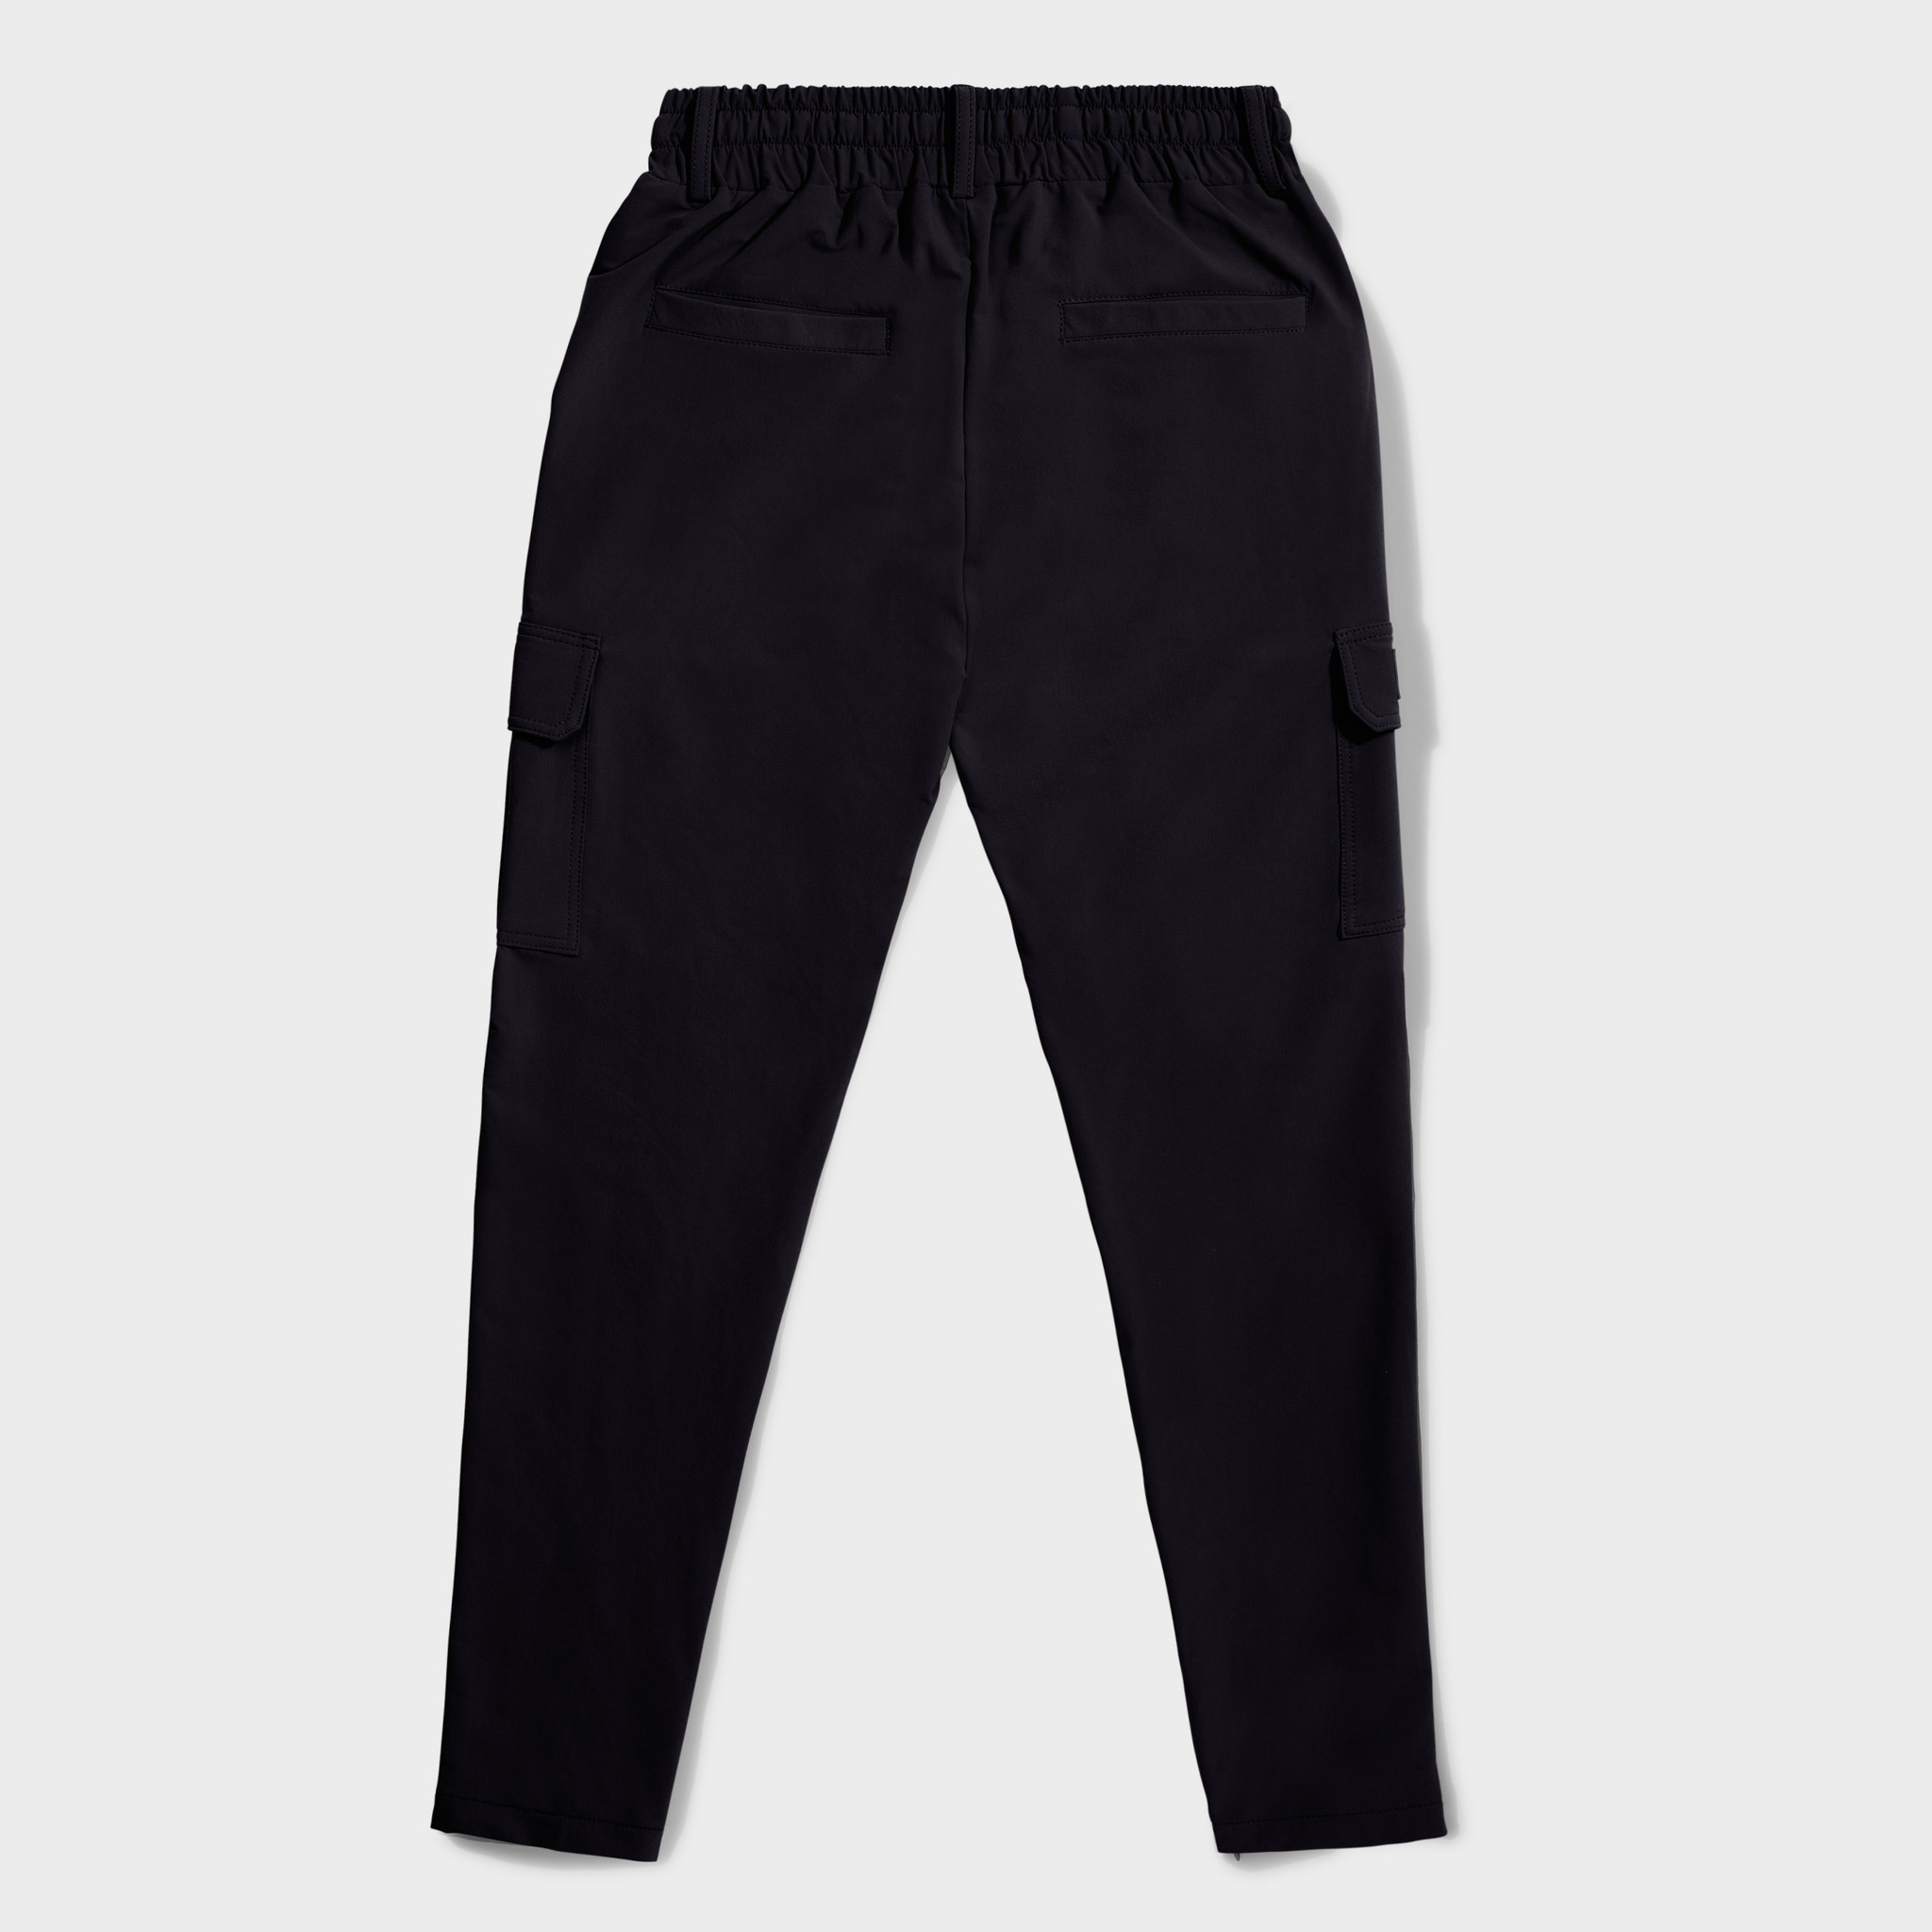 Cargo pants black-2